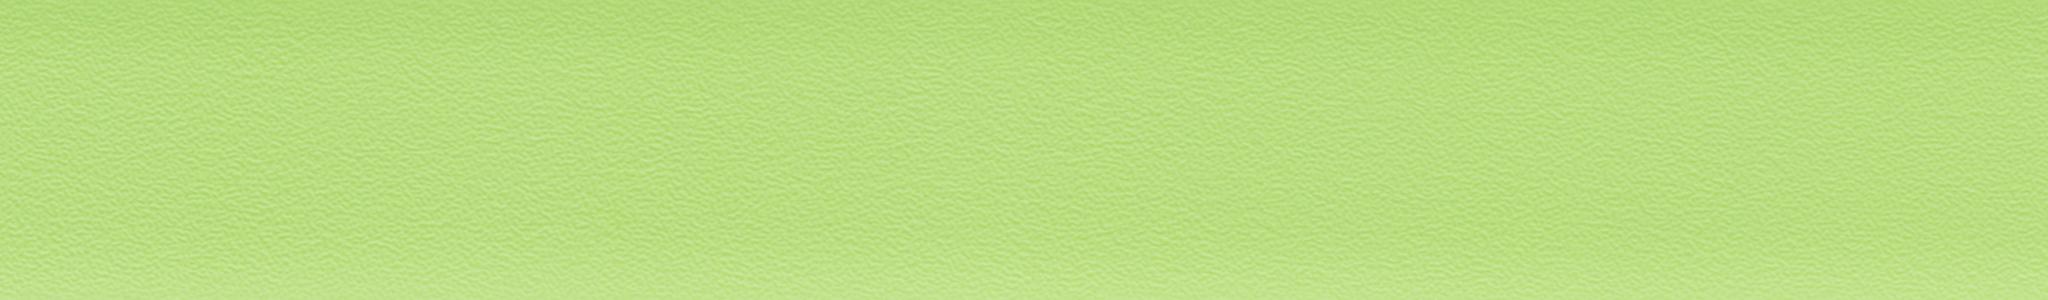 HU 16627 ABS hrana zelená perla 101